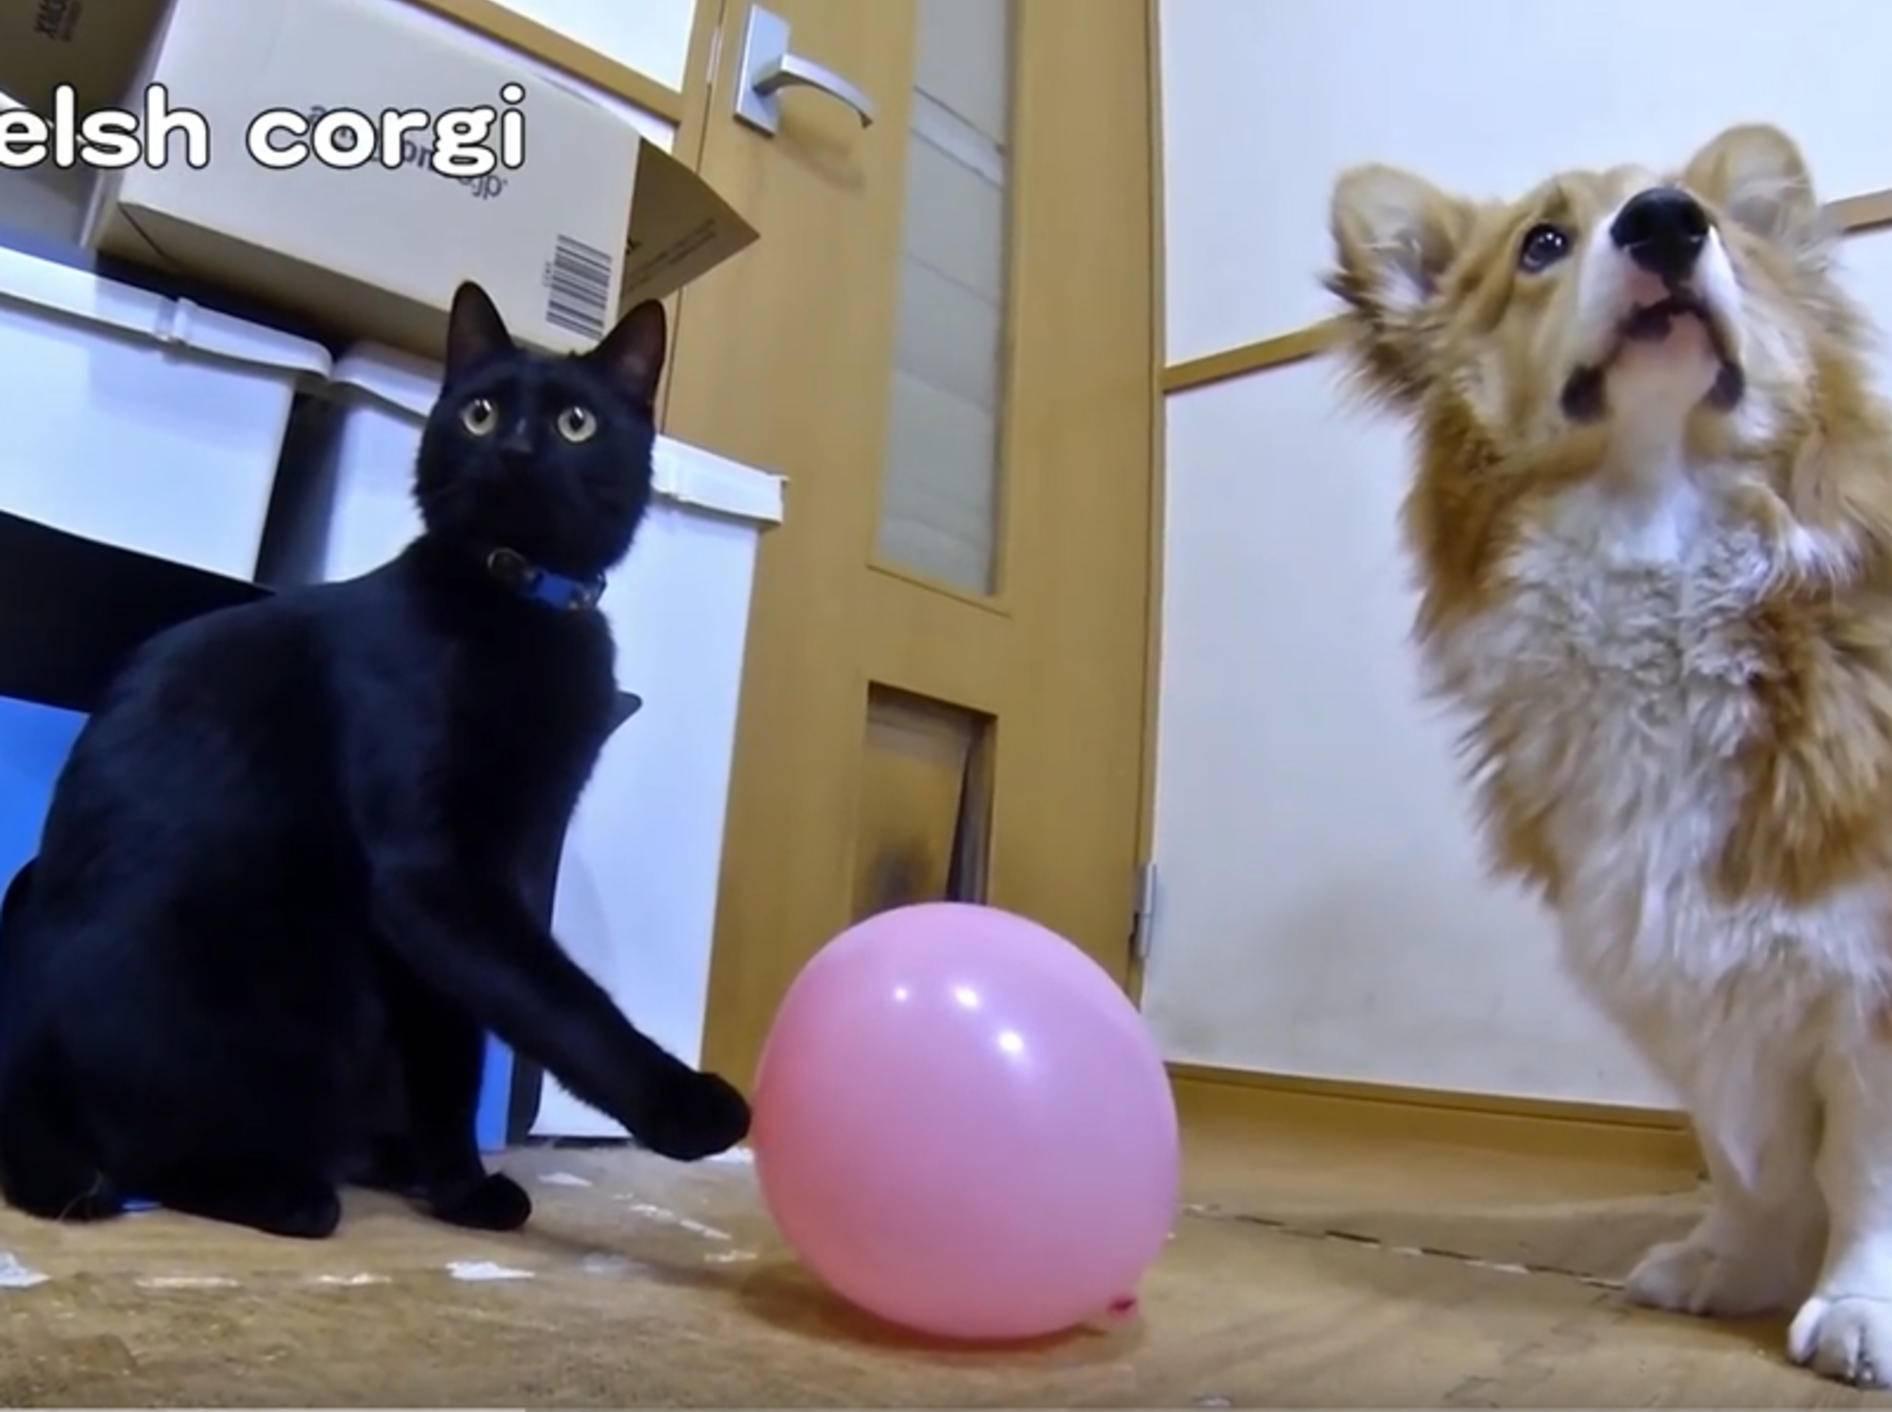 Corgi Roku und Kätzchen Kuro spielen mit Ballon – YouTube / Goro@Welsh corgi